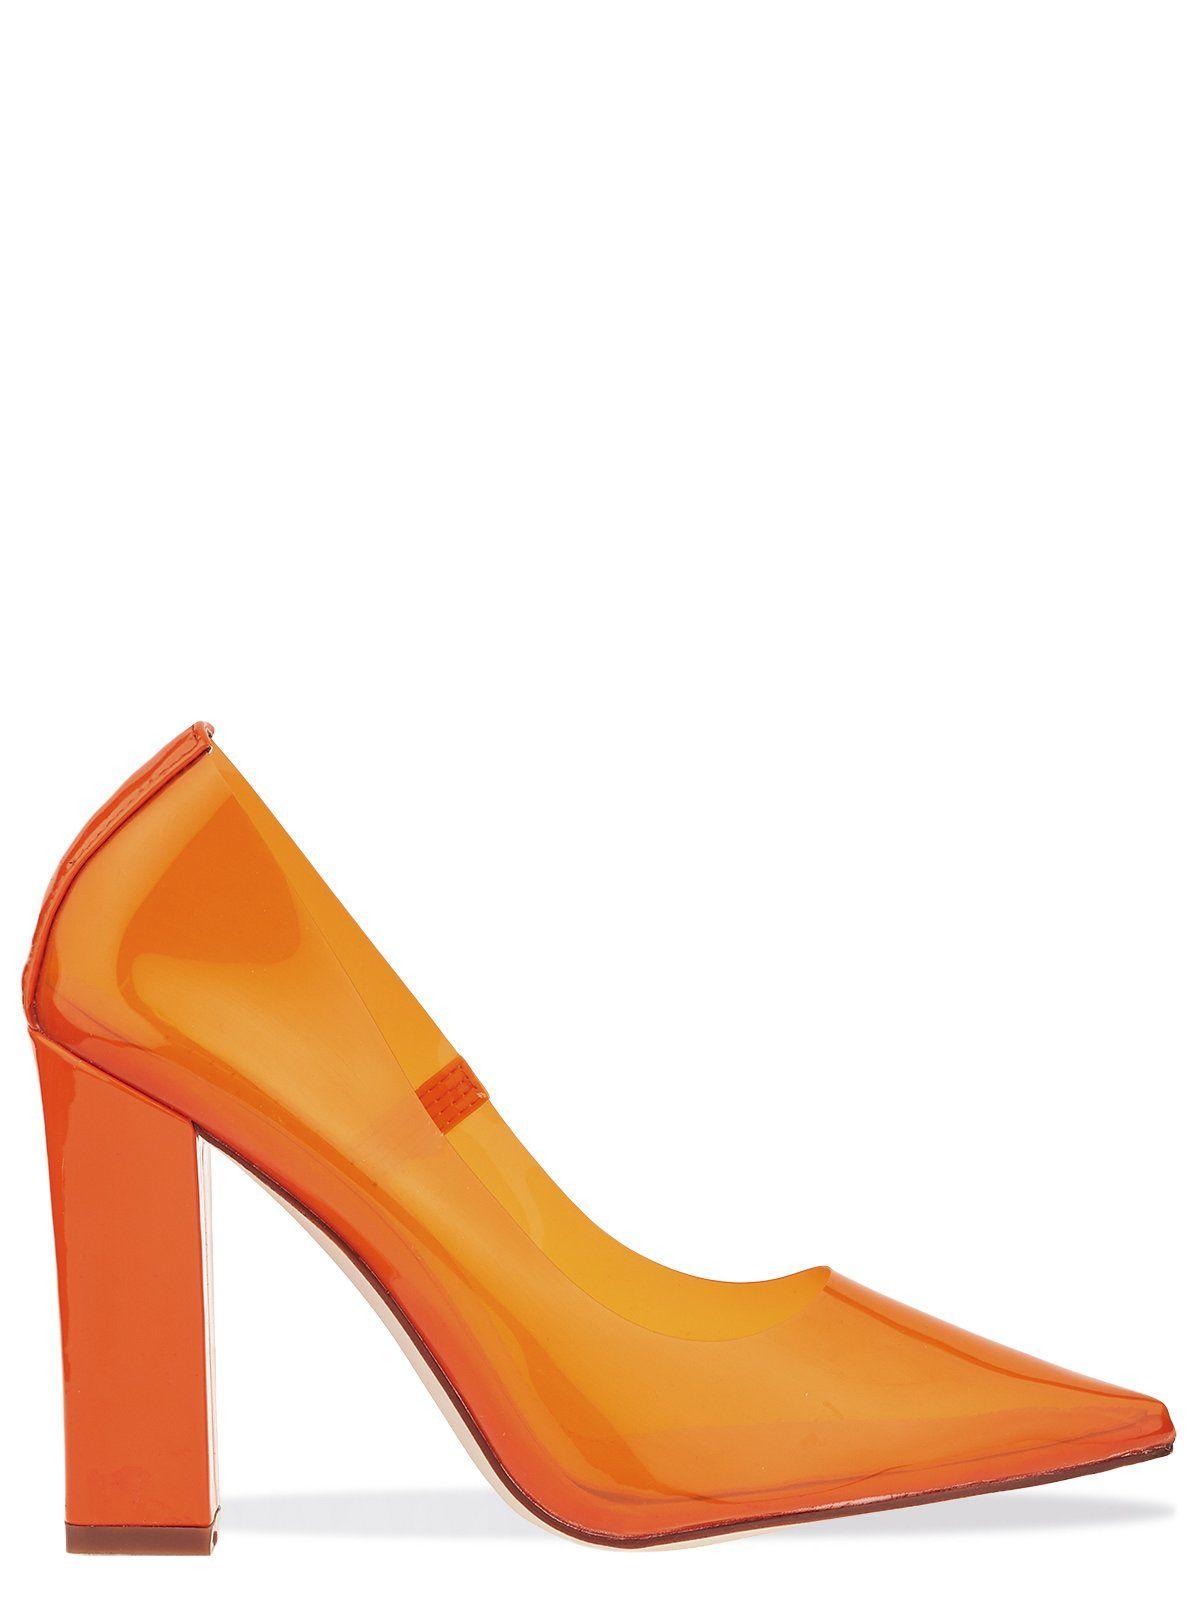 62246dc9112a Patent Block Heel Perspex Court Shoe In Orange | PERSPEX | Shoes ...